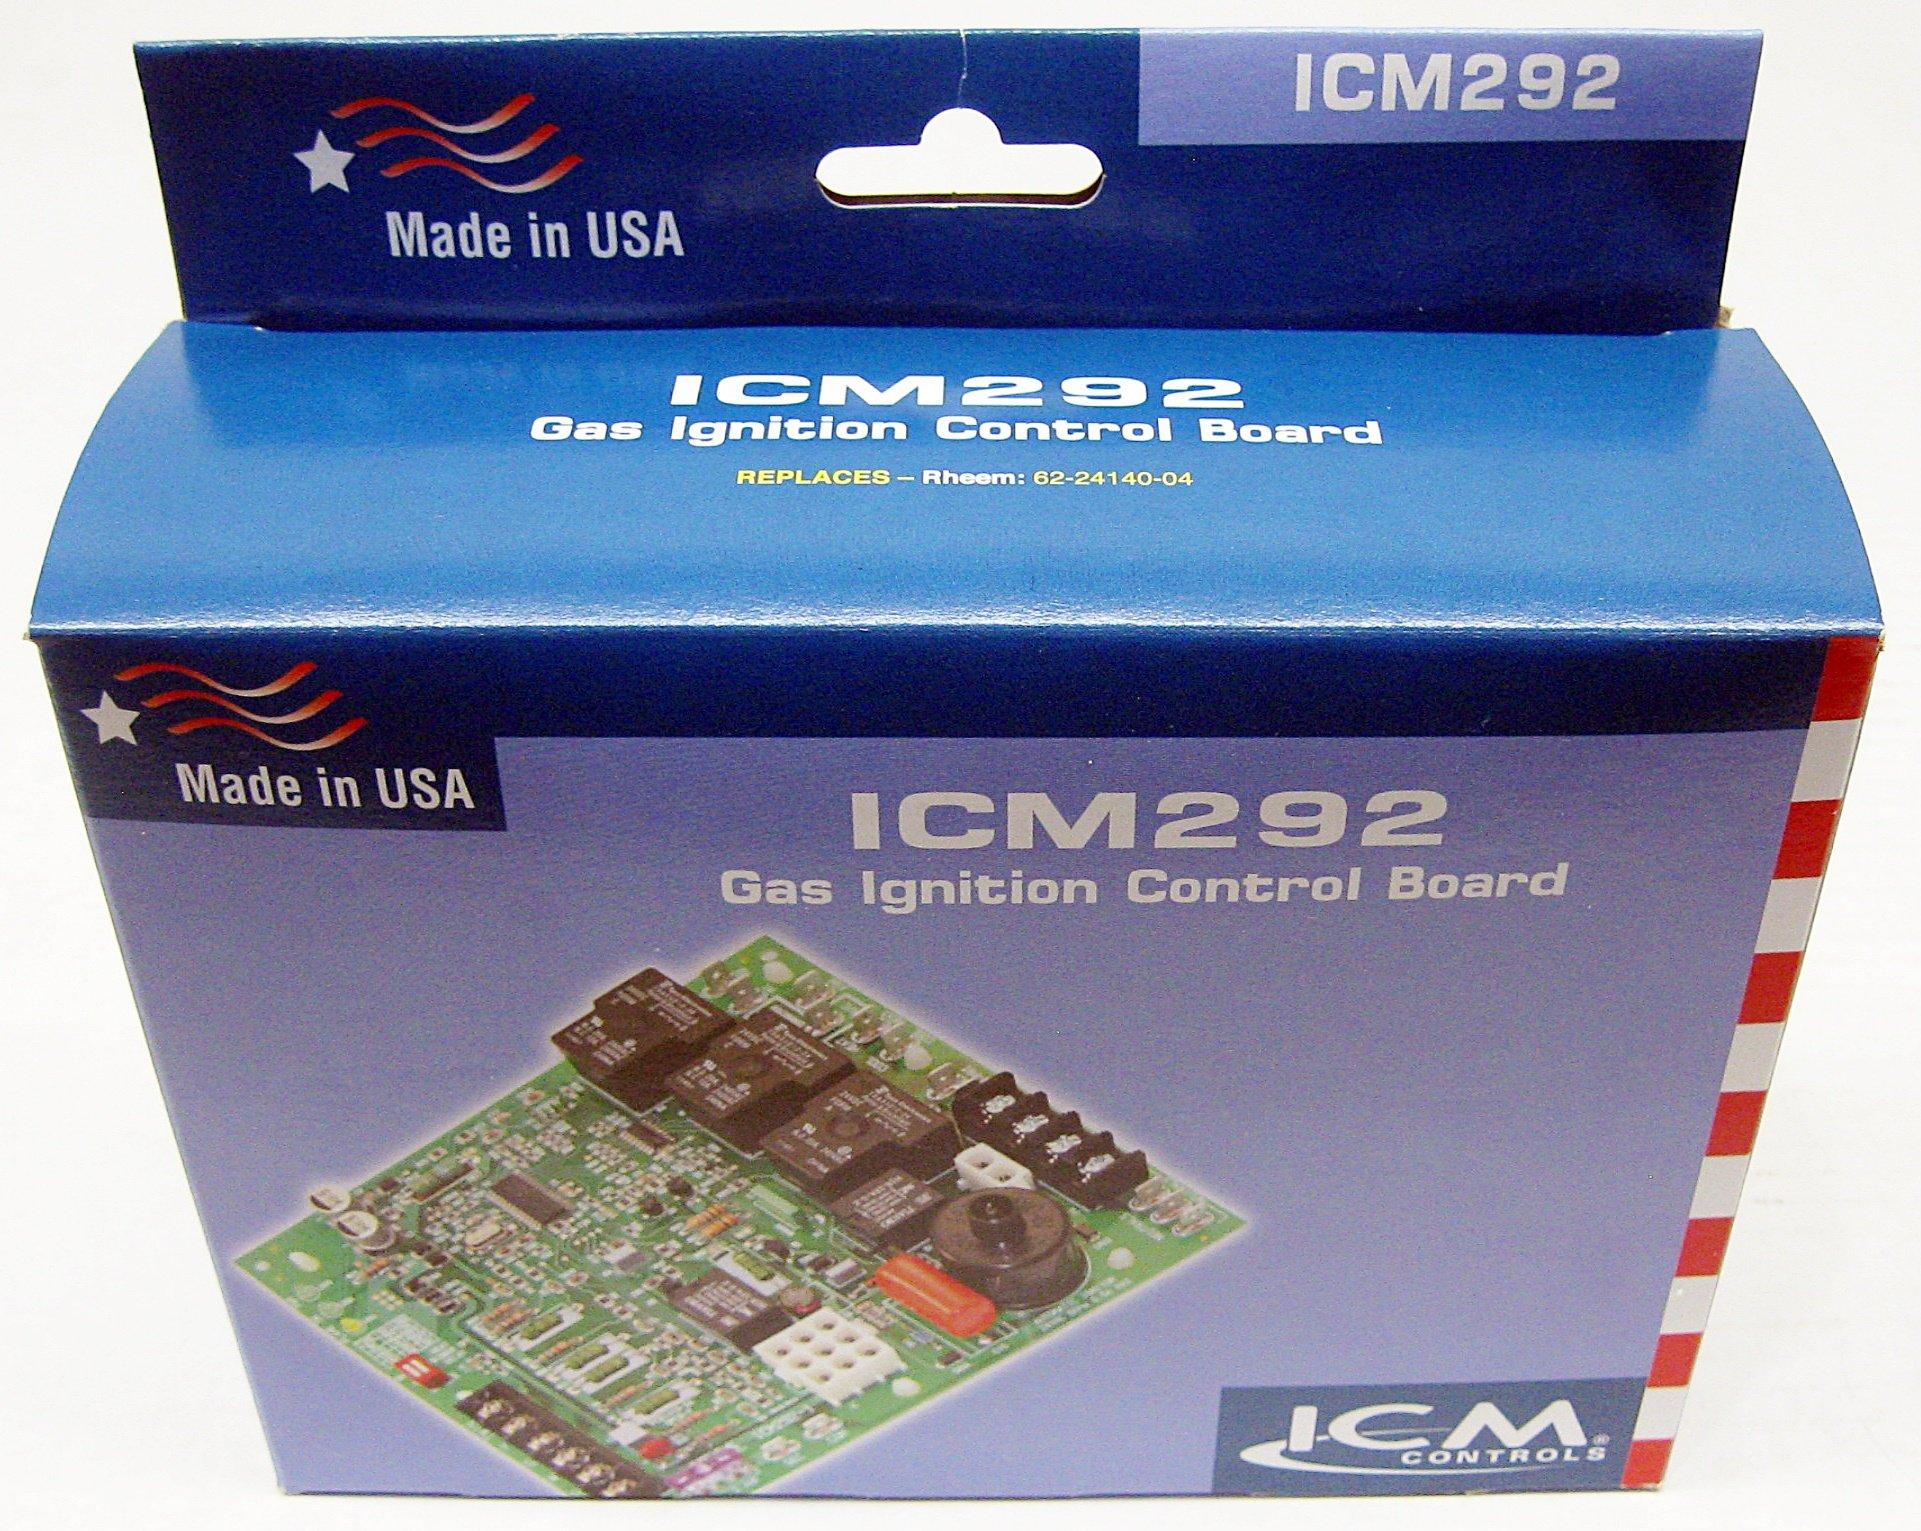 ICM Product 292 by ICM (Image #6)